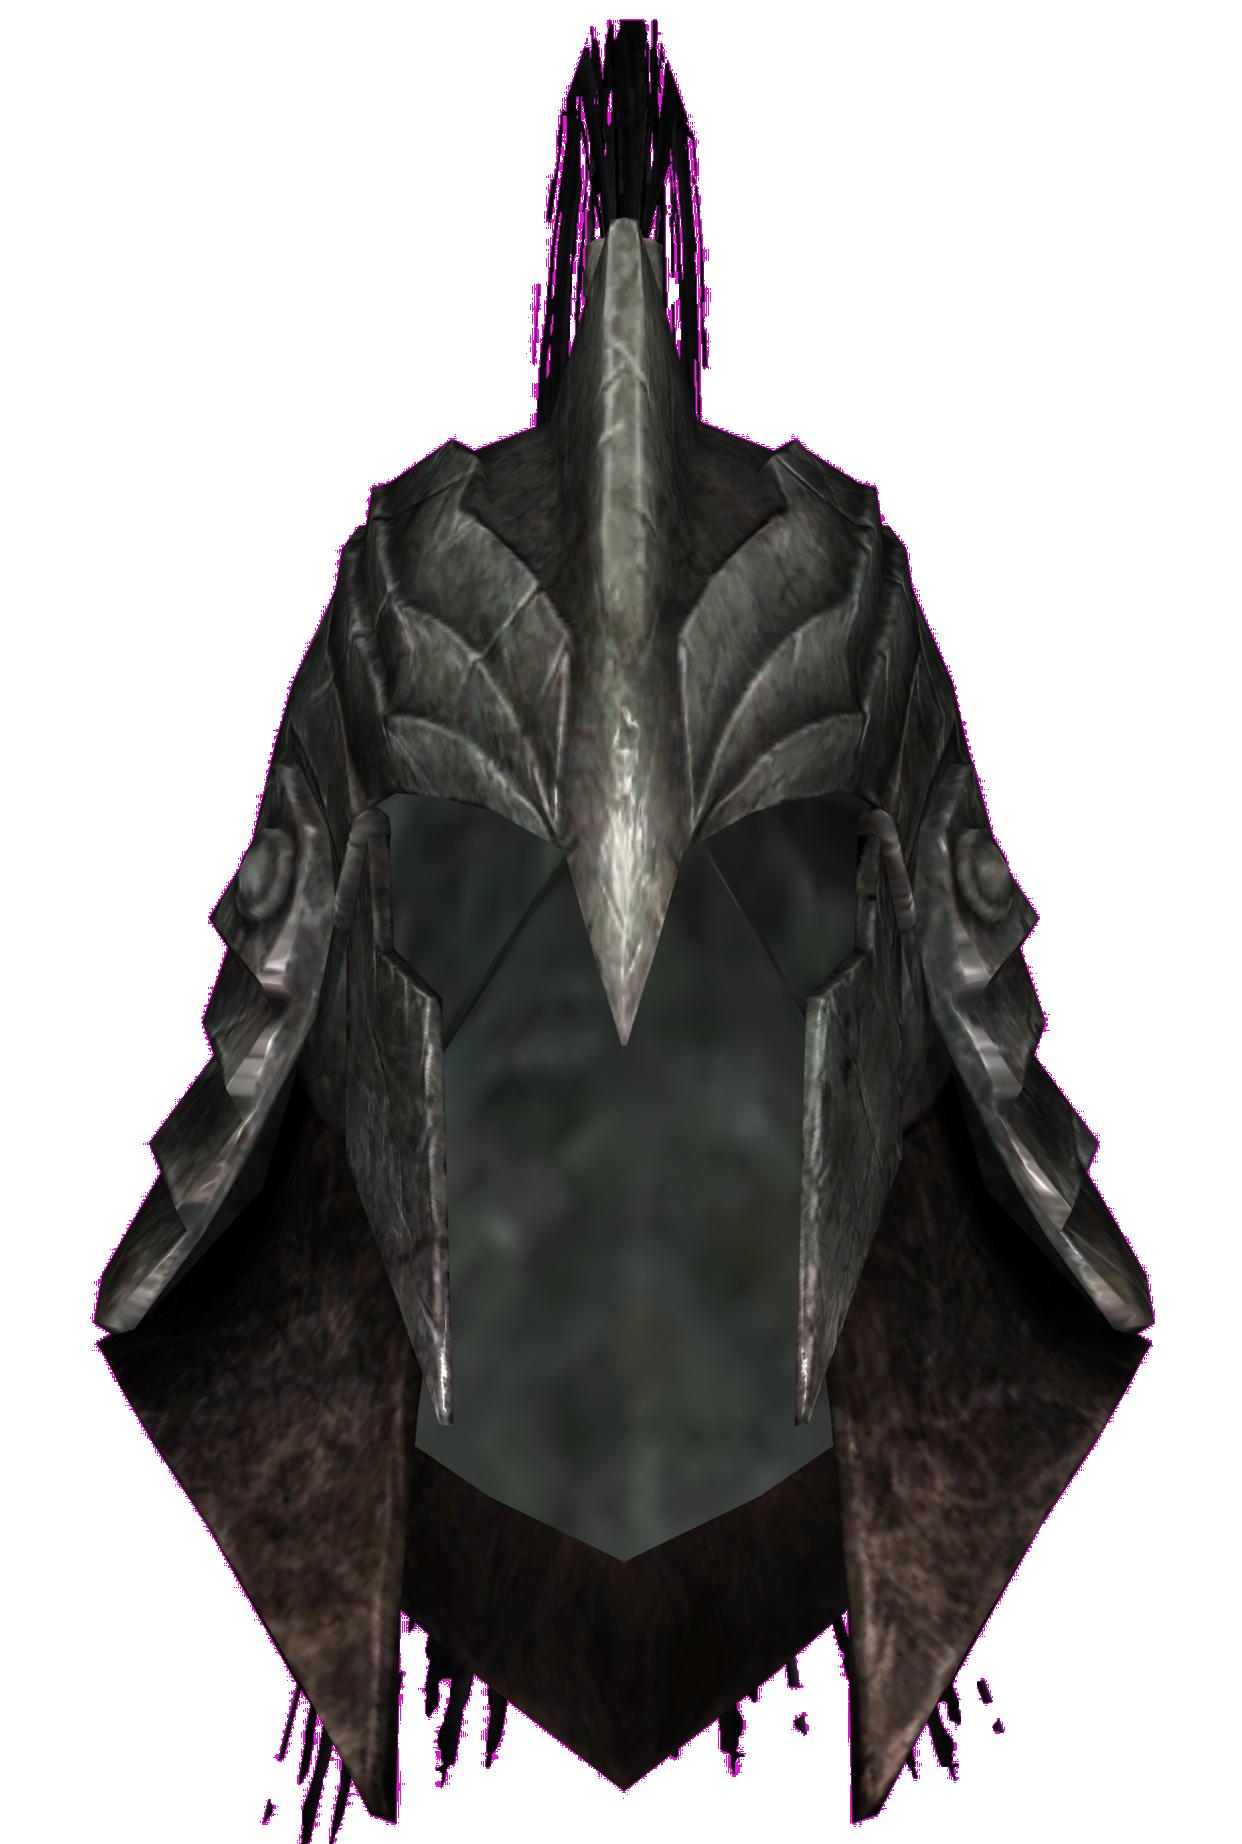 Orcish Helmet (Skyrim)